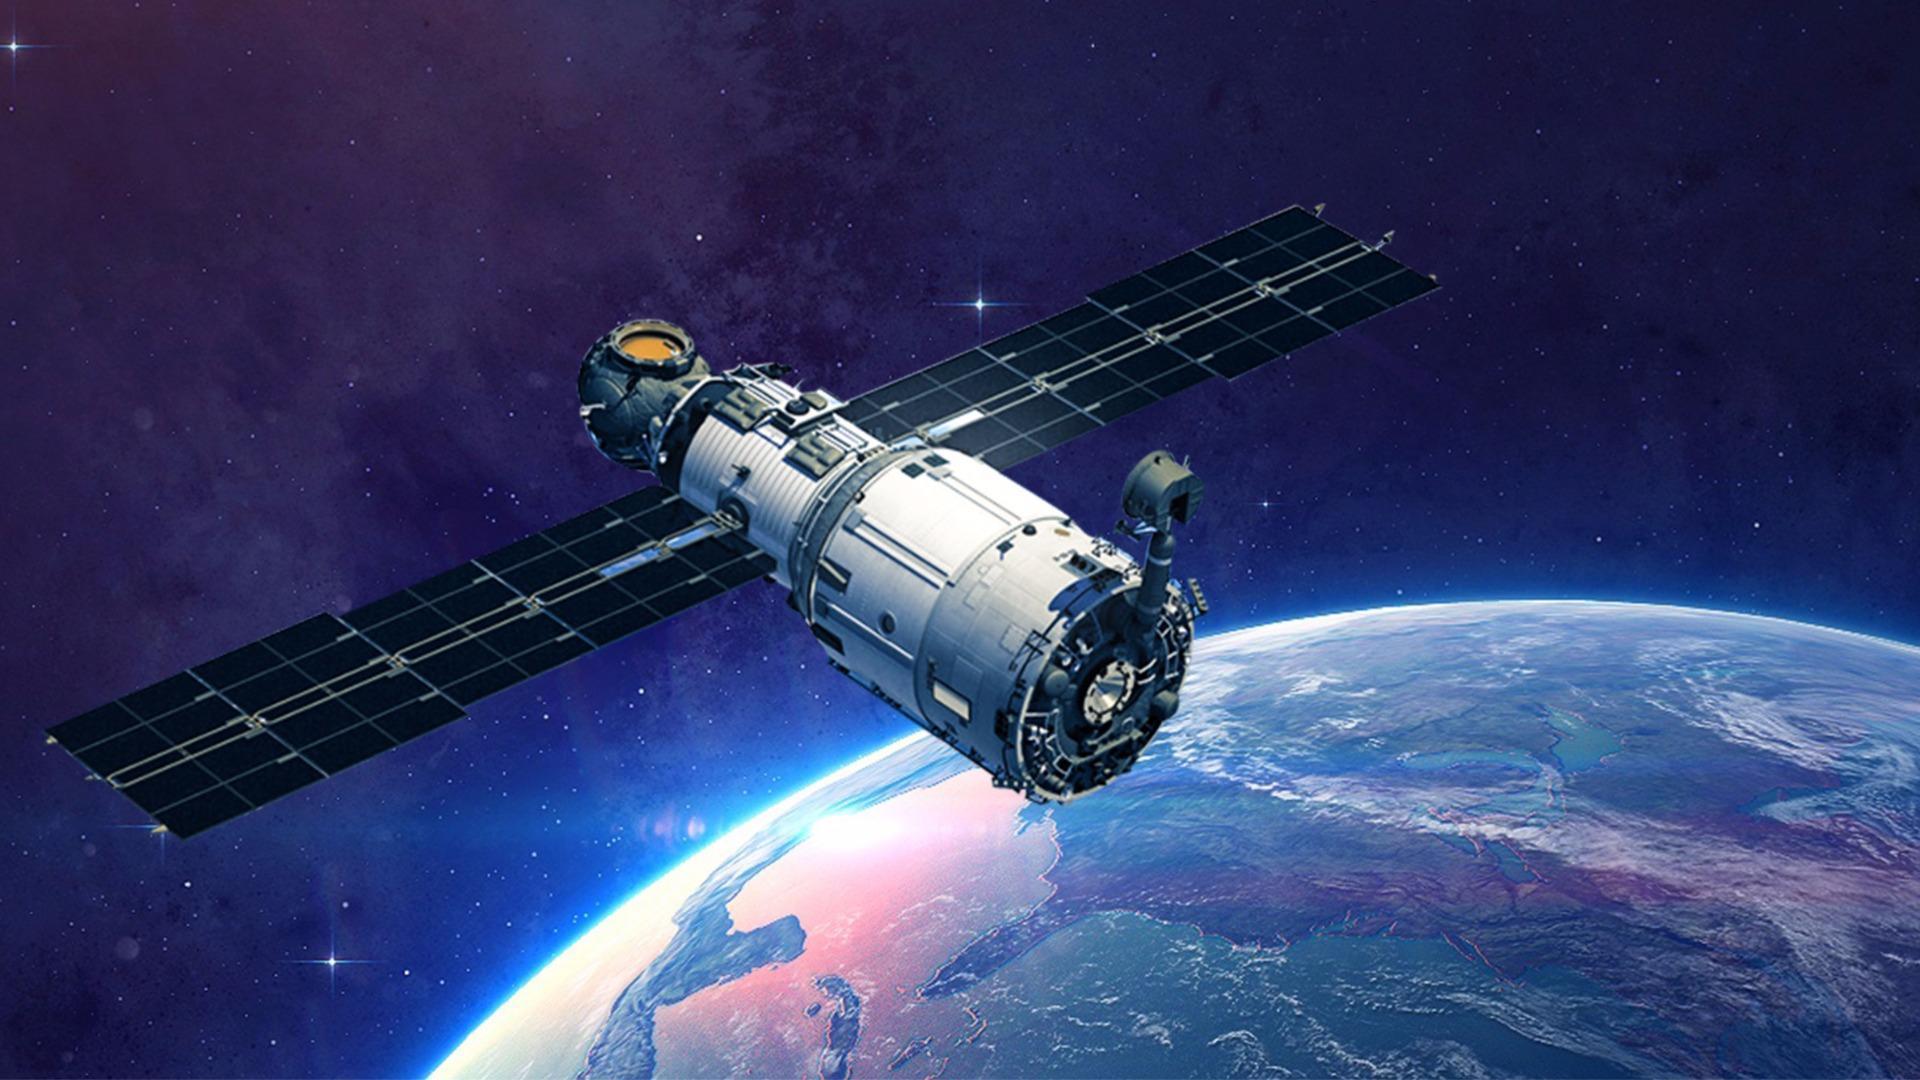 Satellite wallpapers top free satellite backgrounds wallpaperaccess - Satellite wallpaper hd ...